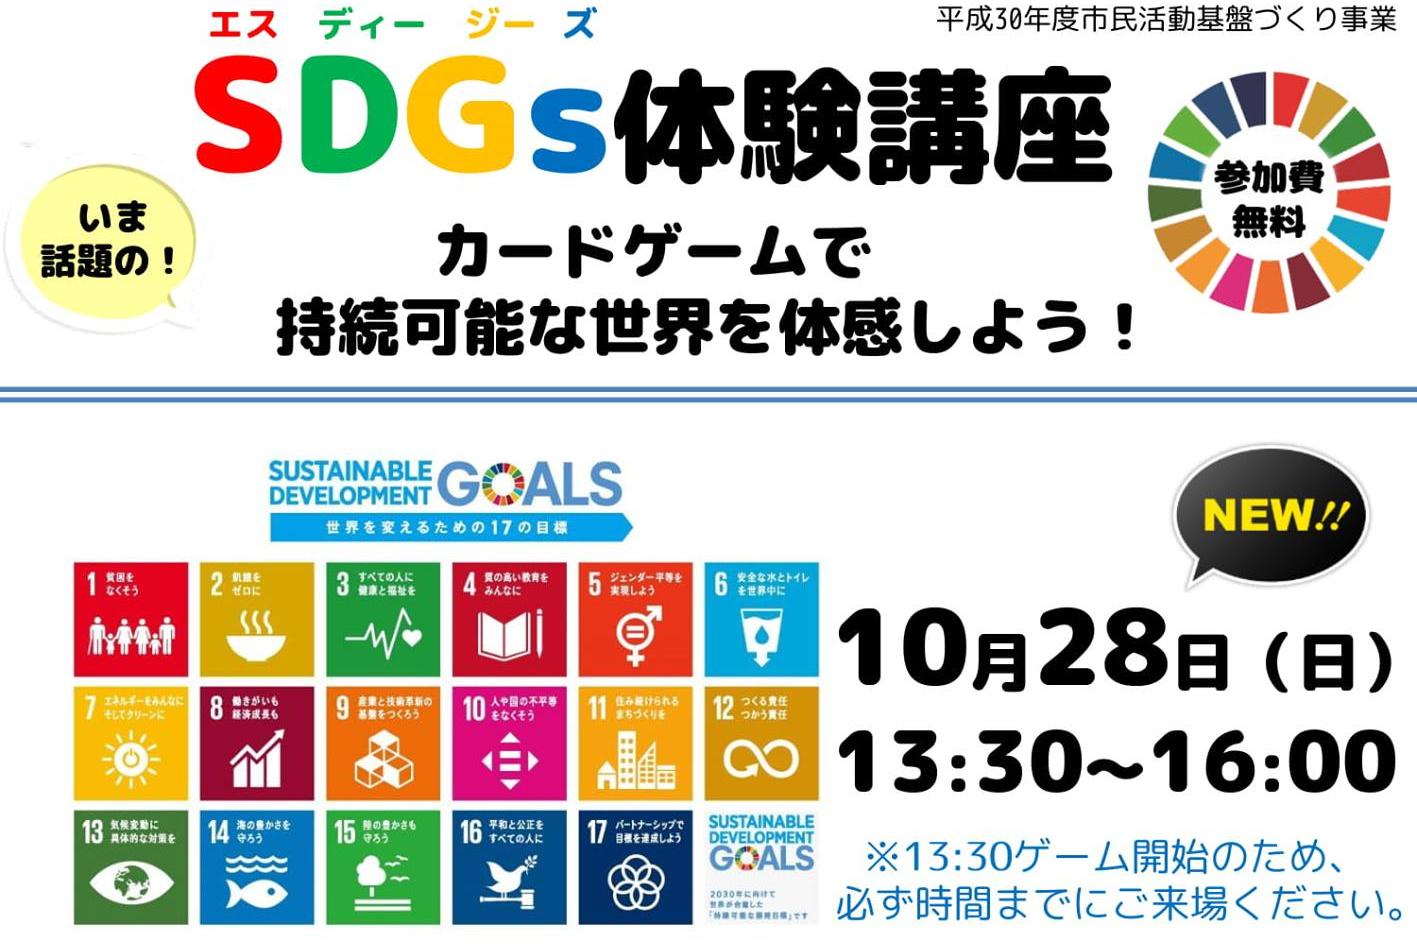 SDGs体験講座~カードゲームで持続可能な世界を体験しよう!